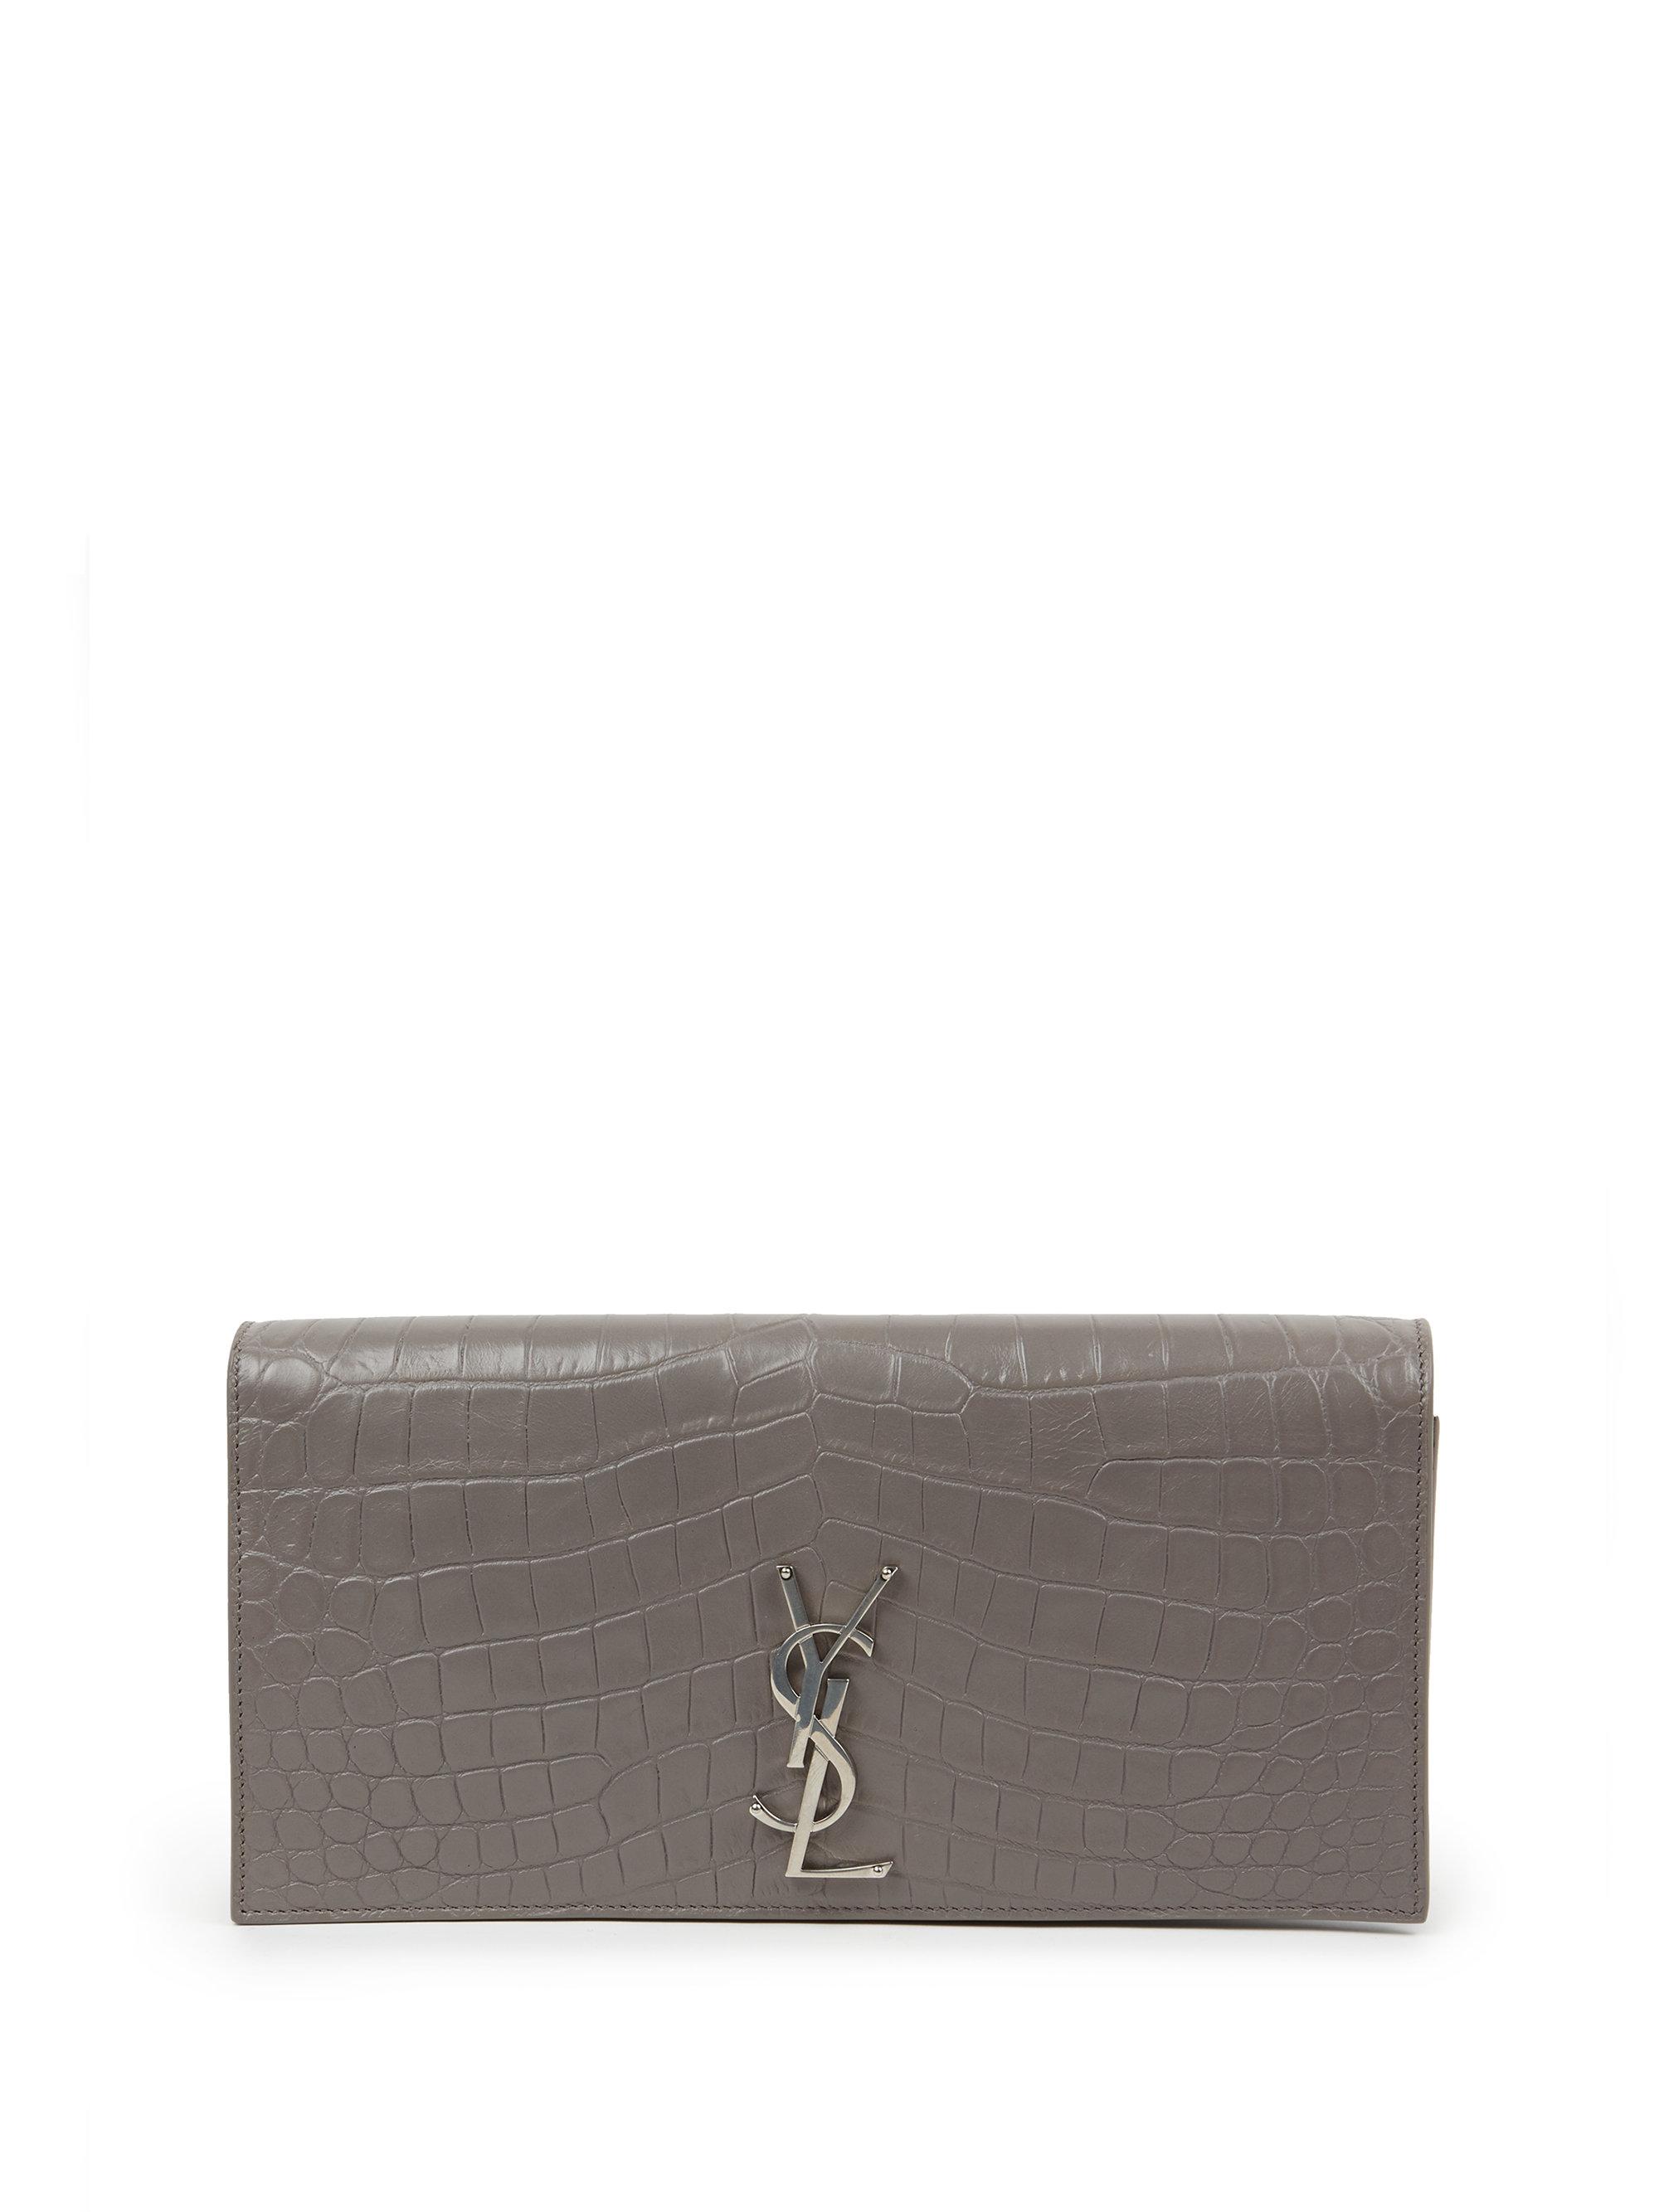 yves saint laurent luggage bags - yves saint laurent women monogram python embossed leather clutch ...